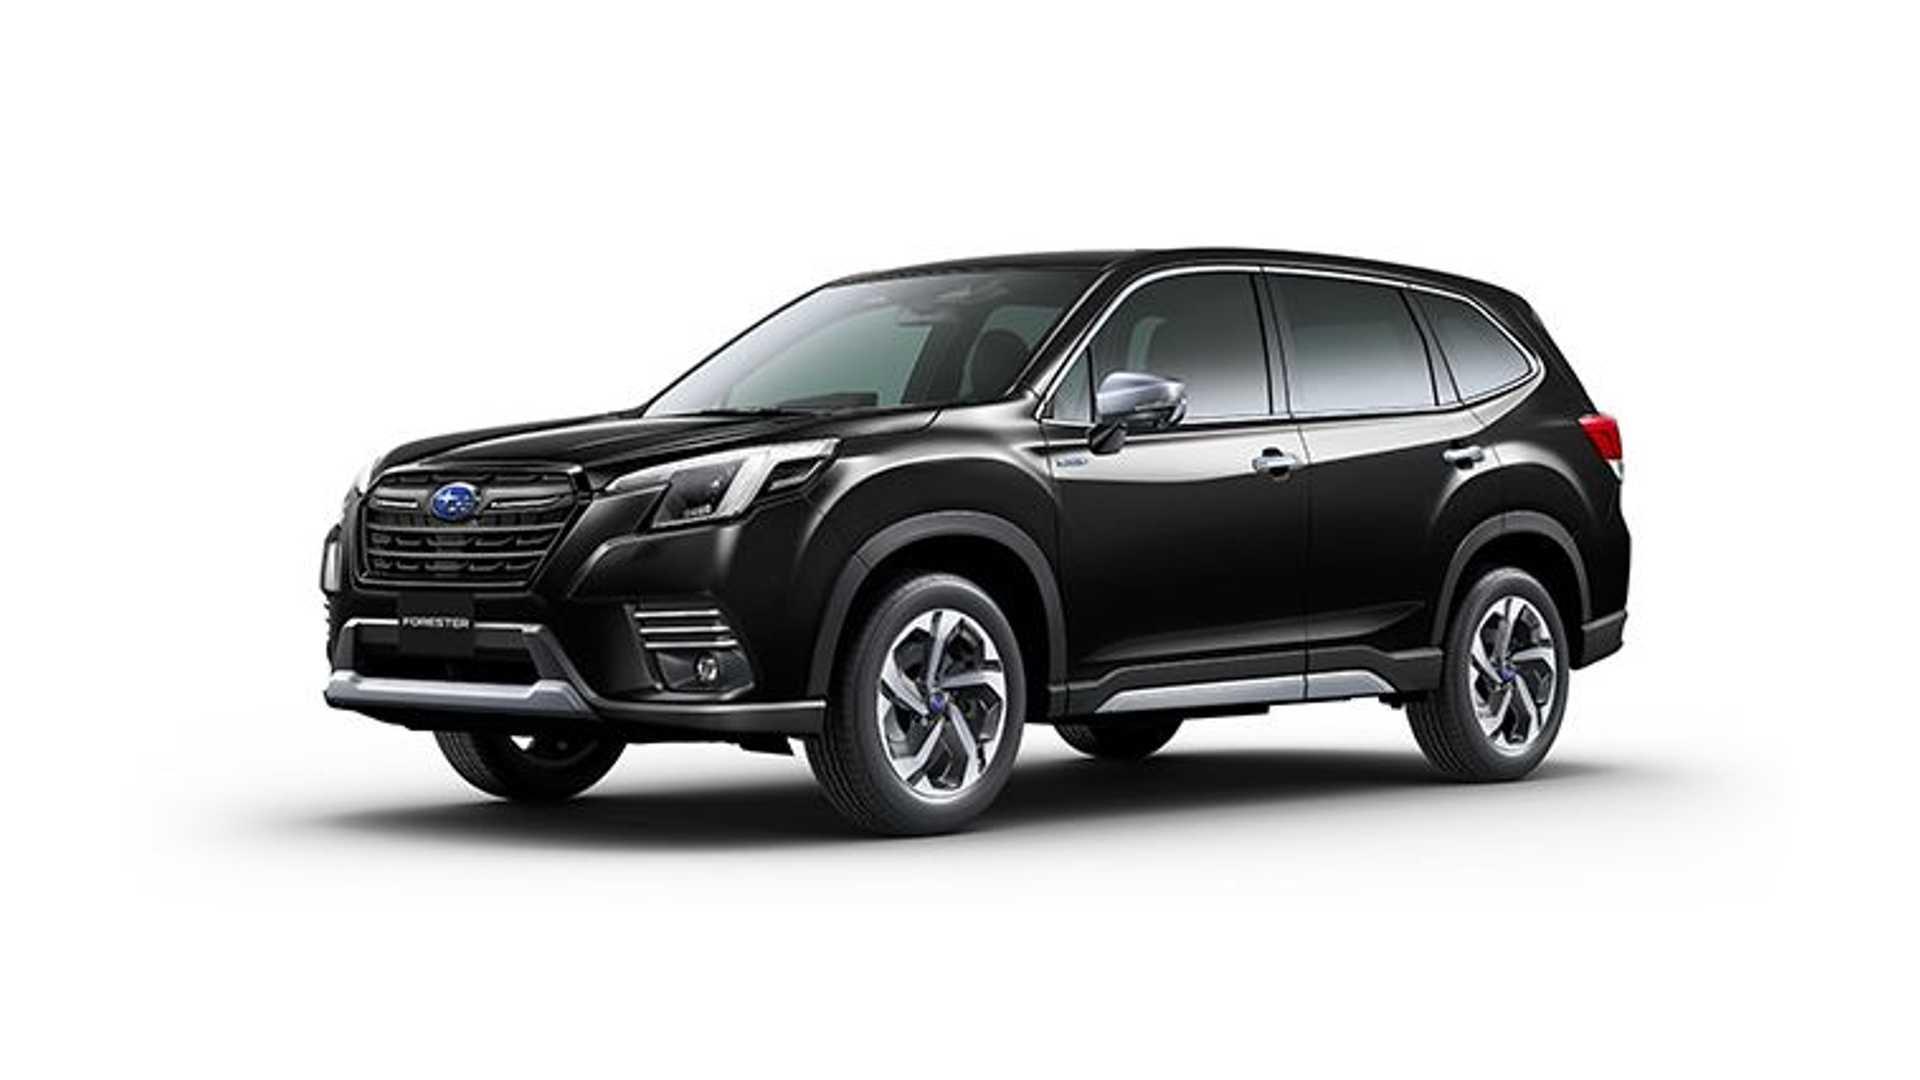 Subaru-Forester-facelift-21